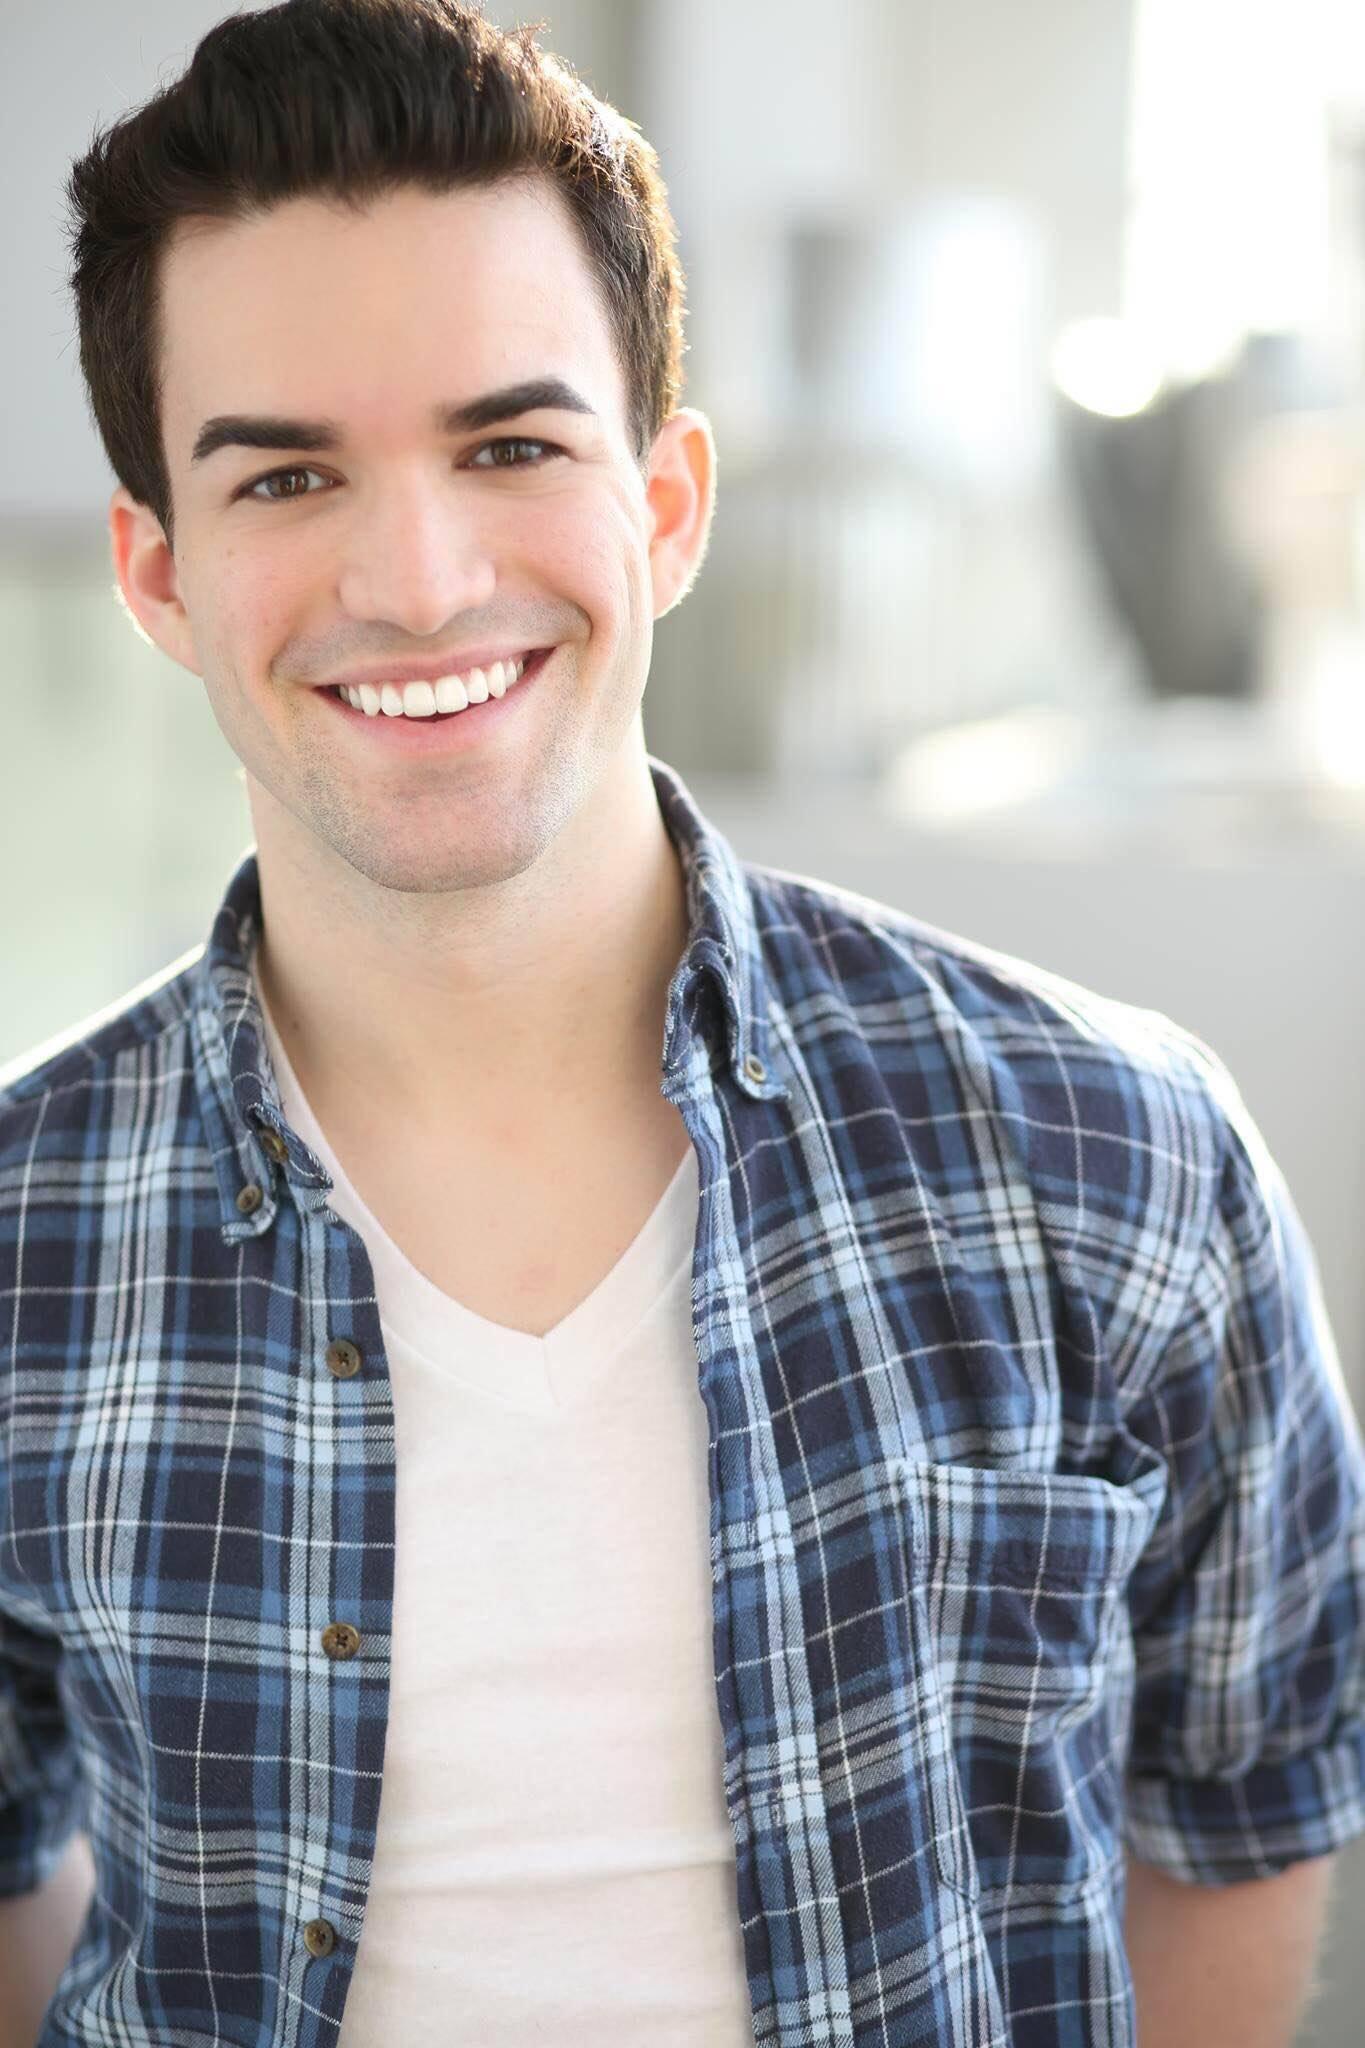 Tony Clements Broadway Best Vocal Coach Matt Farnsworth Vocal Studio Best Voice Teacher in the World NY MF Voice app Singing